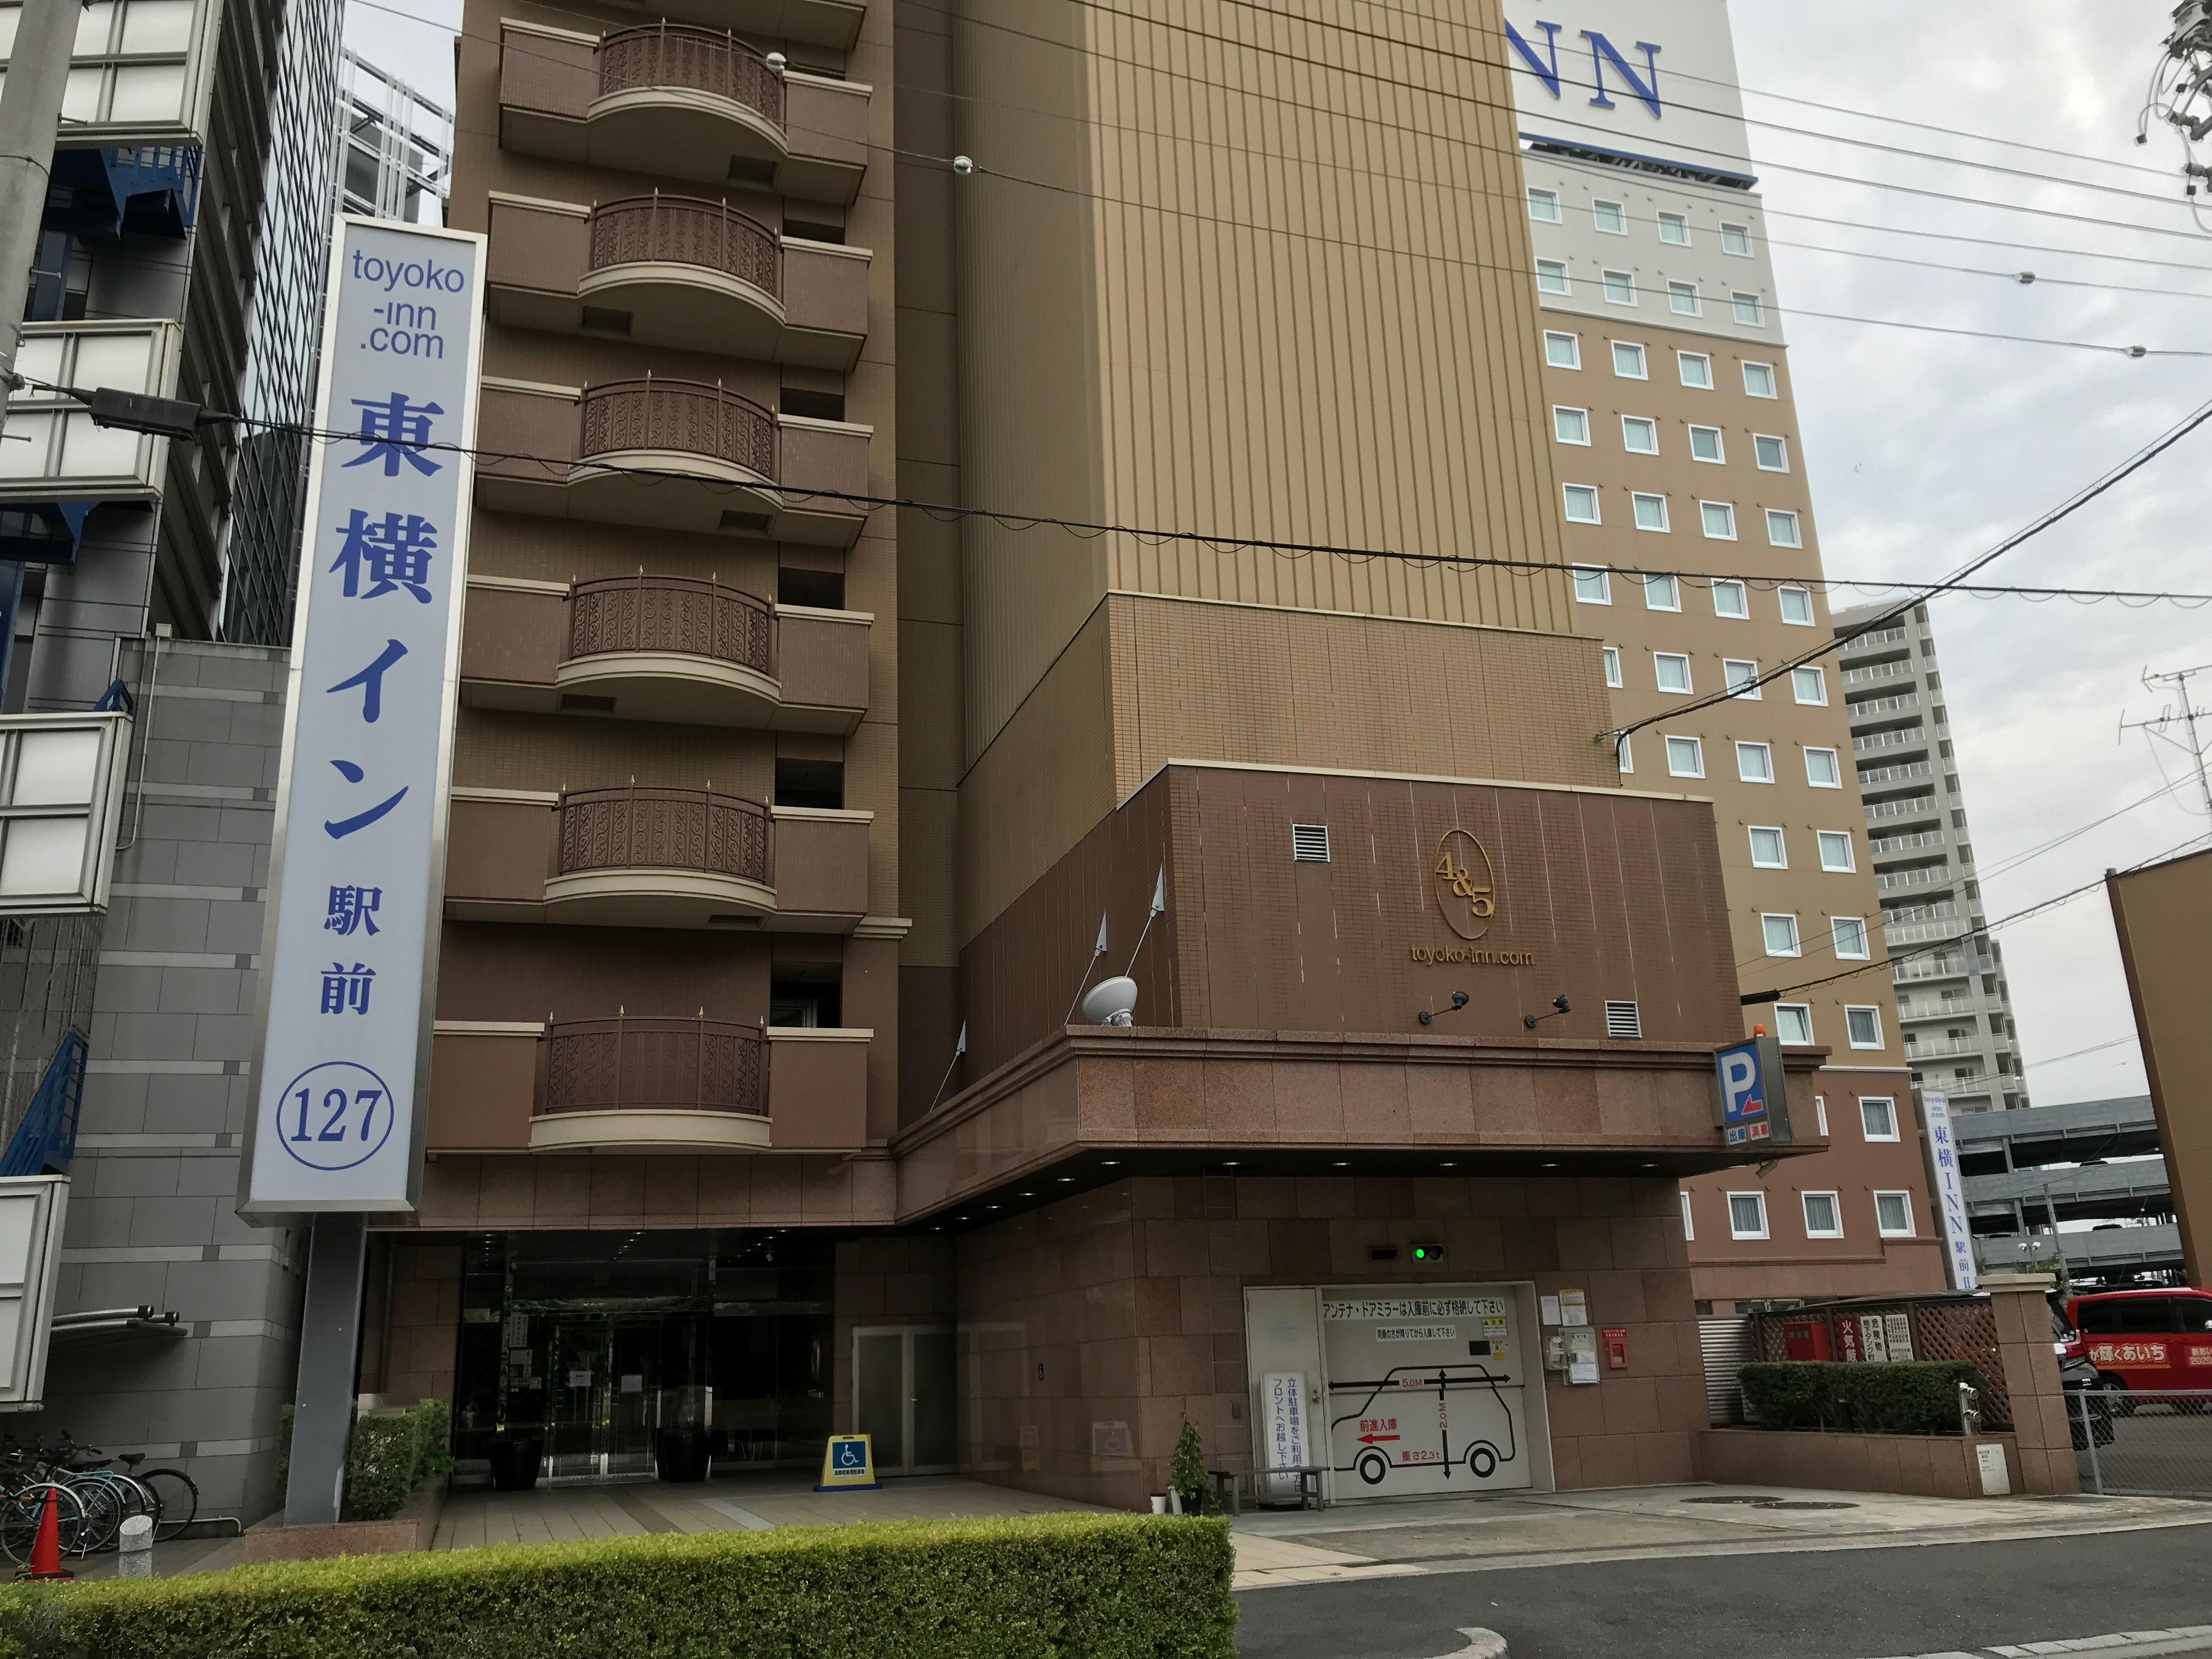 東横イン三河安城駅新幹線南口1の施設画像